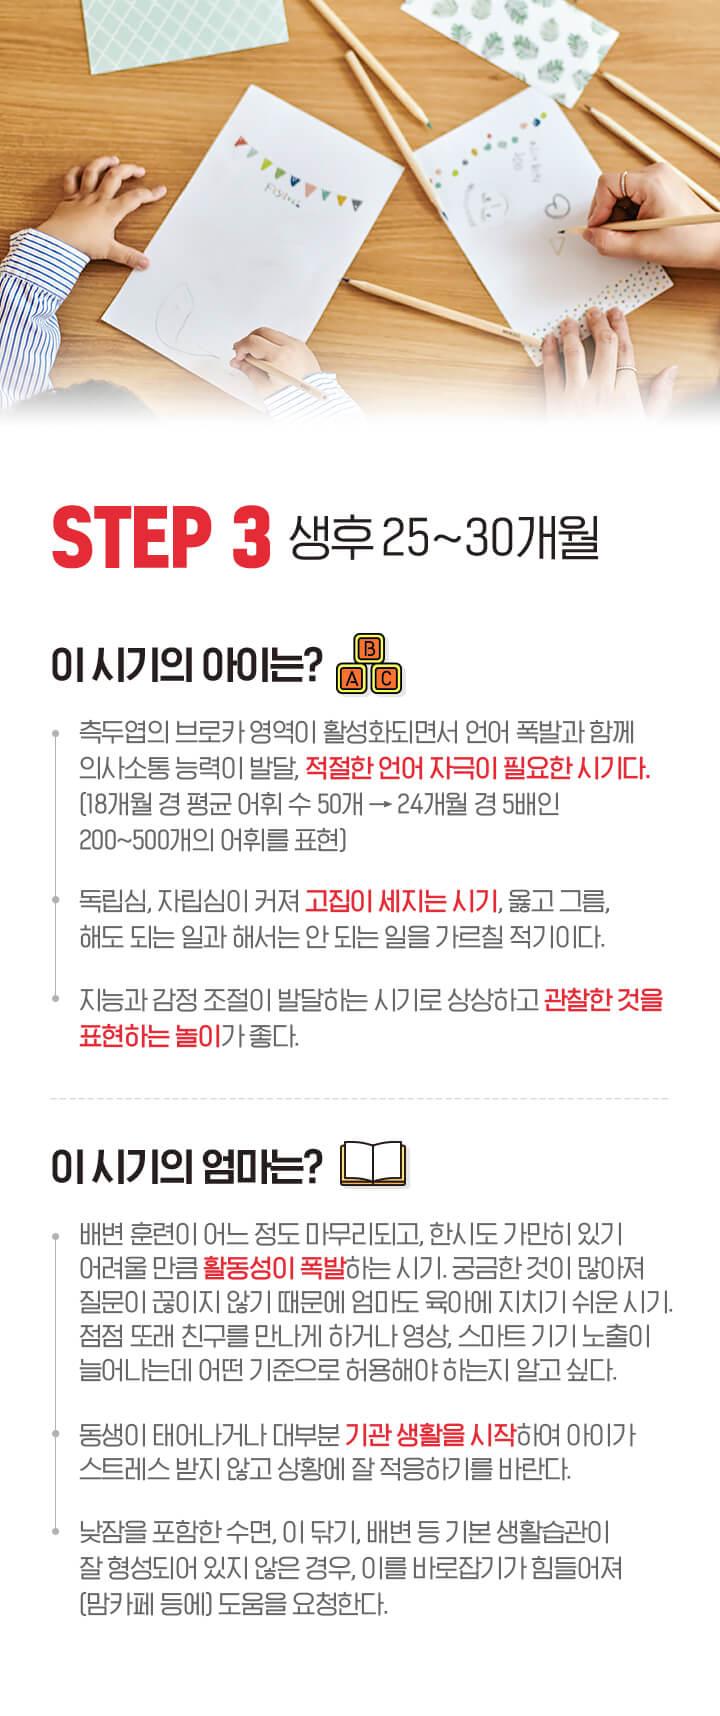 STEP 3 생후 25~30개월